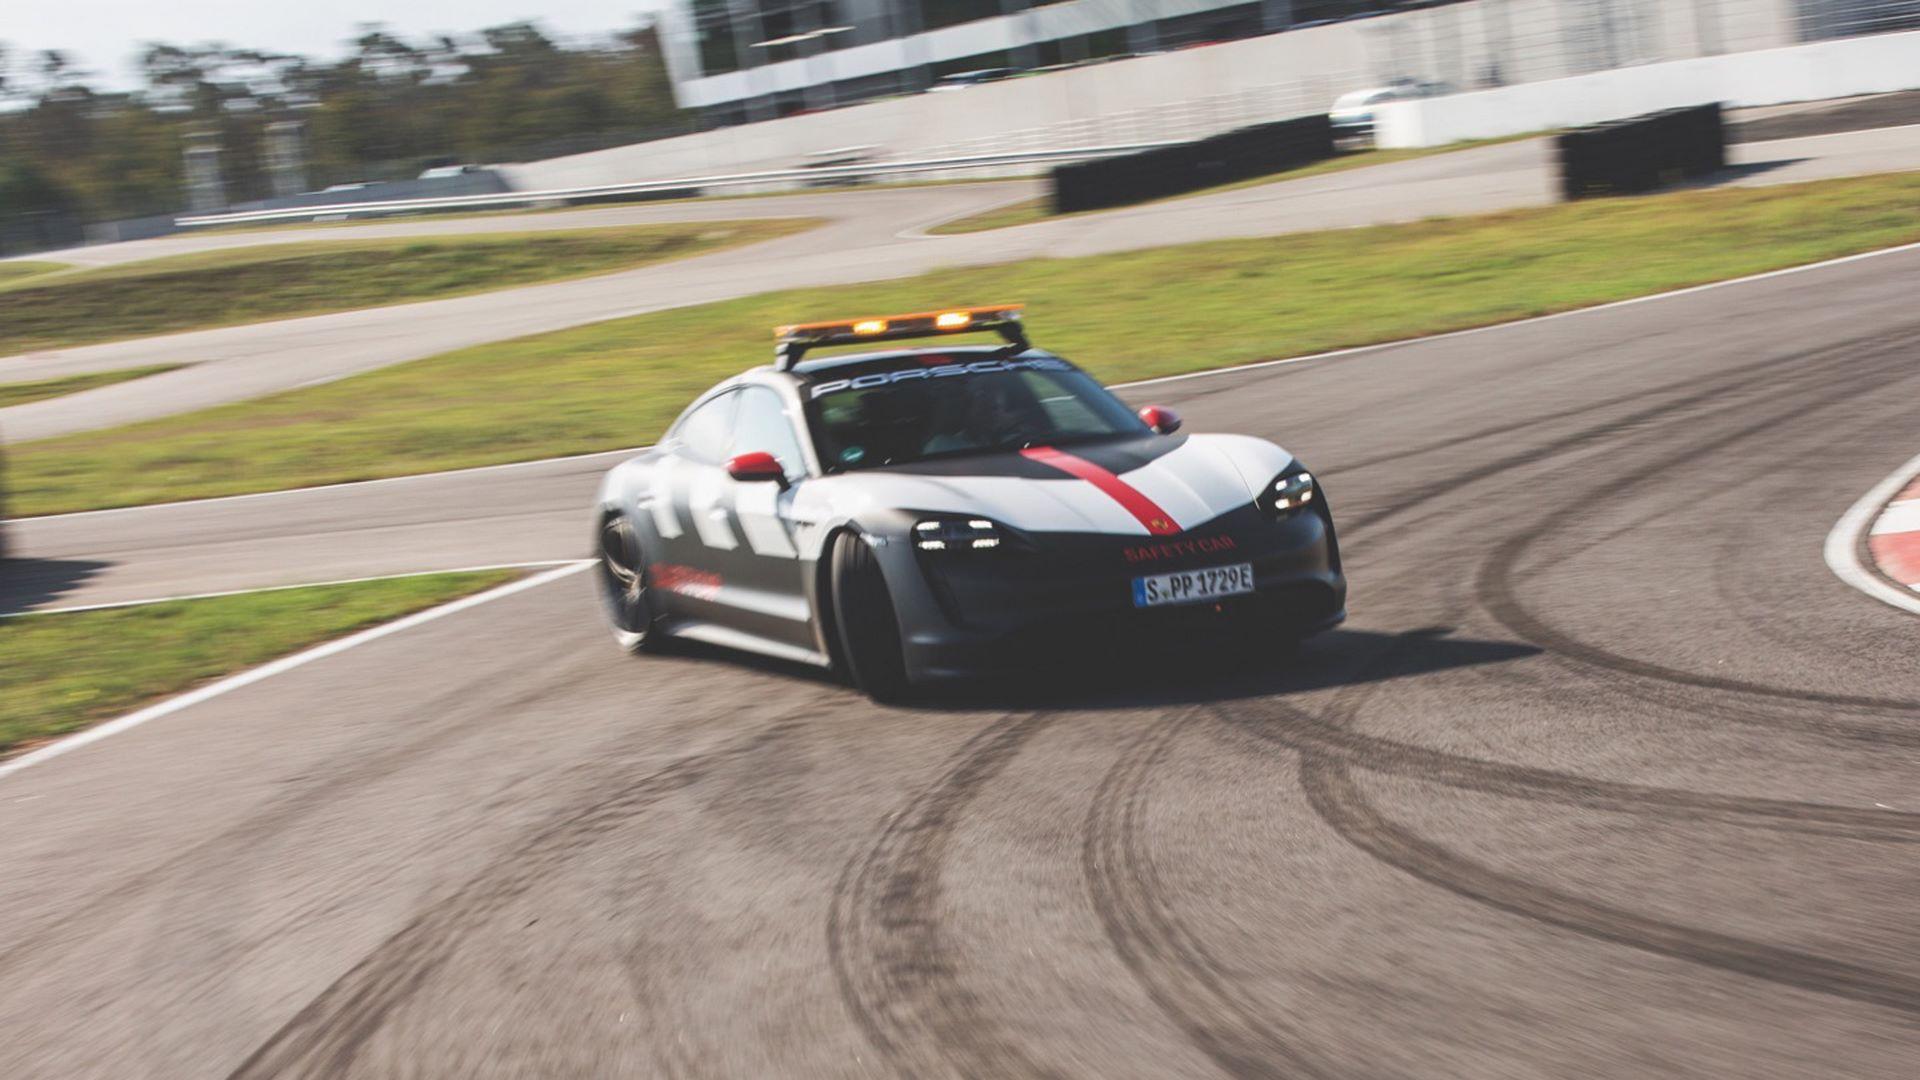 Porsche-Taycan-Turbo-safety-car-Le-Mans-2020-1